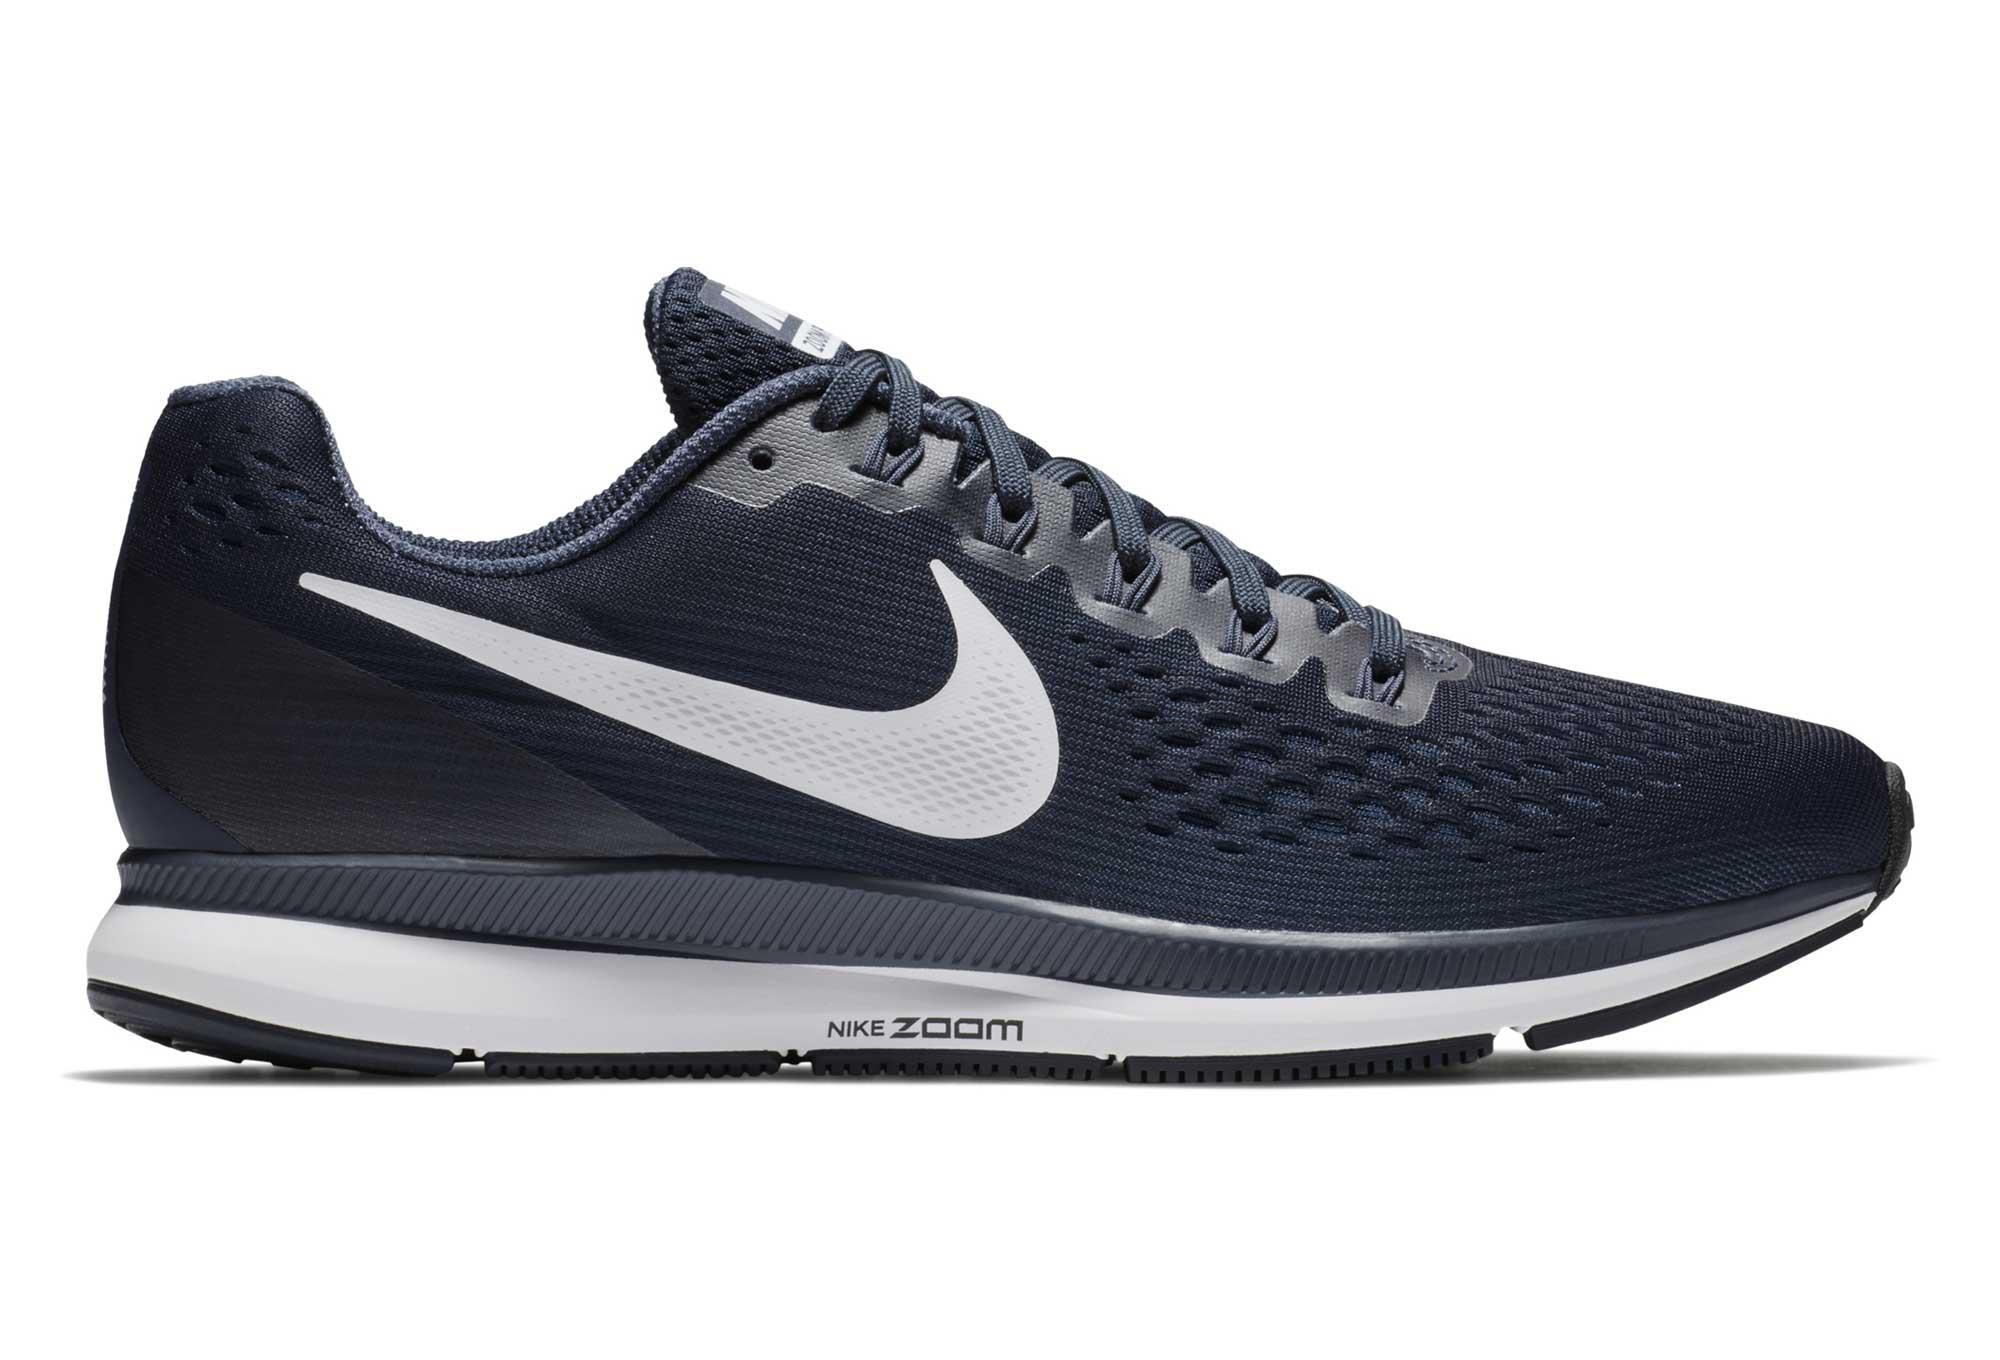 info for 83b61 e76b4 Chaussures de Running Nike Air Zoom Pegasus 34 Bleu   Bleu